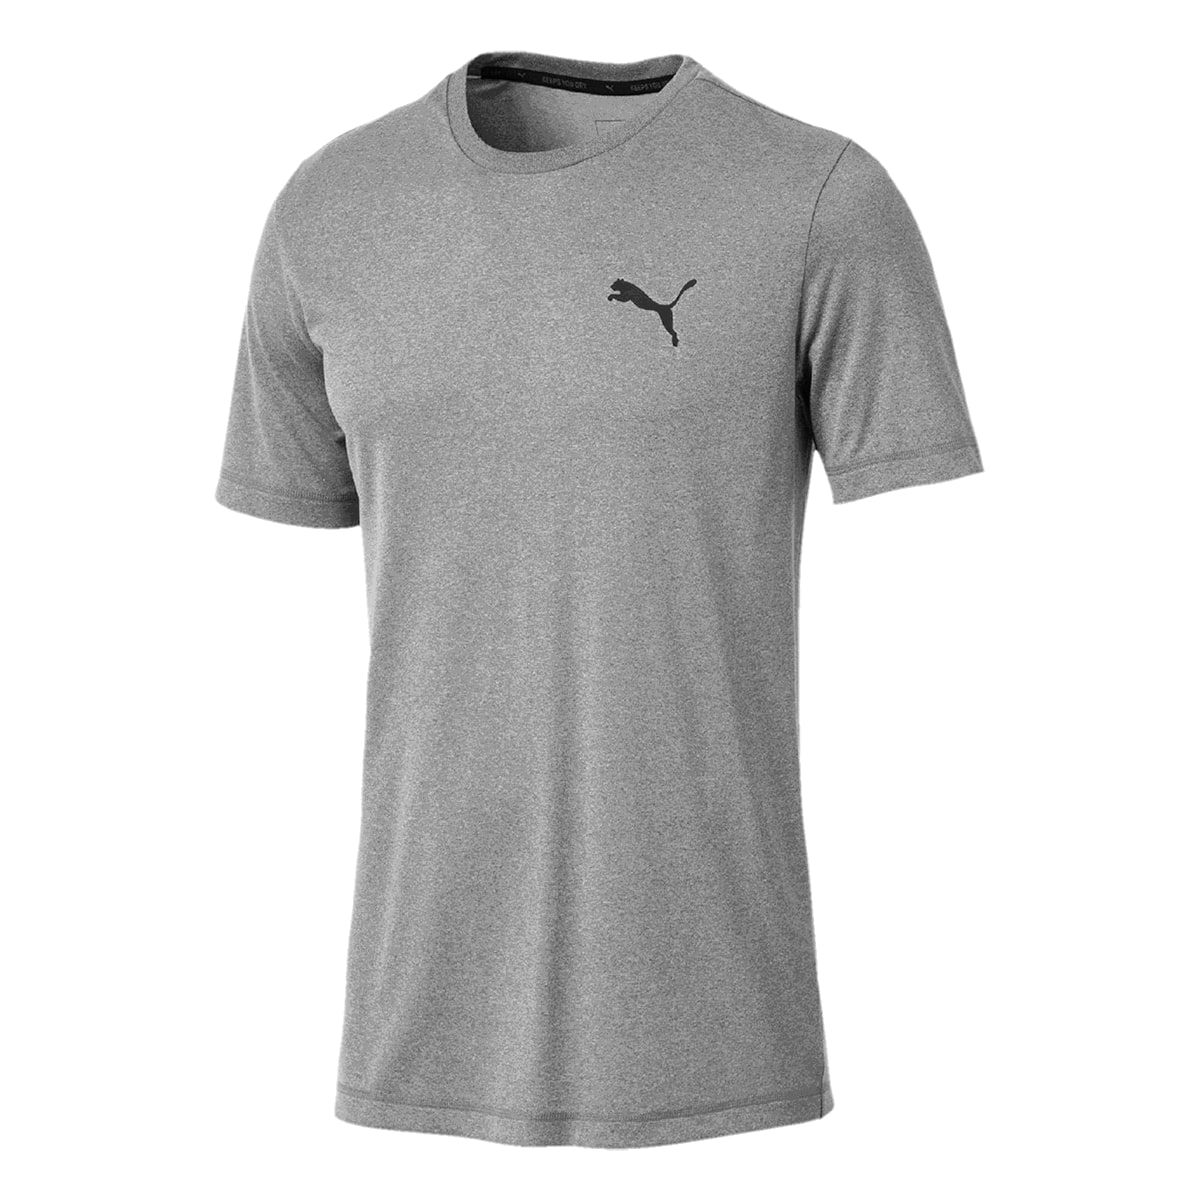 Camiseta Puma Active Masculino Cinza Claro